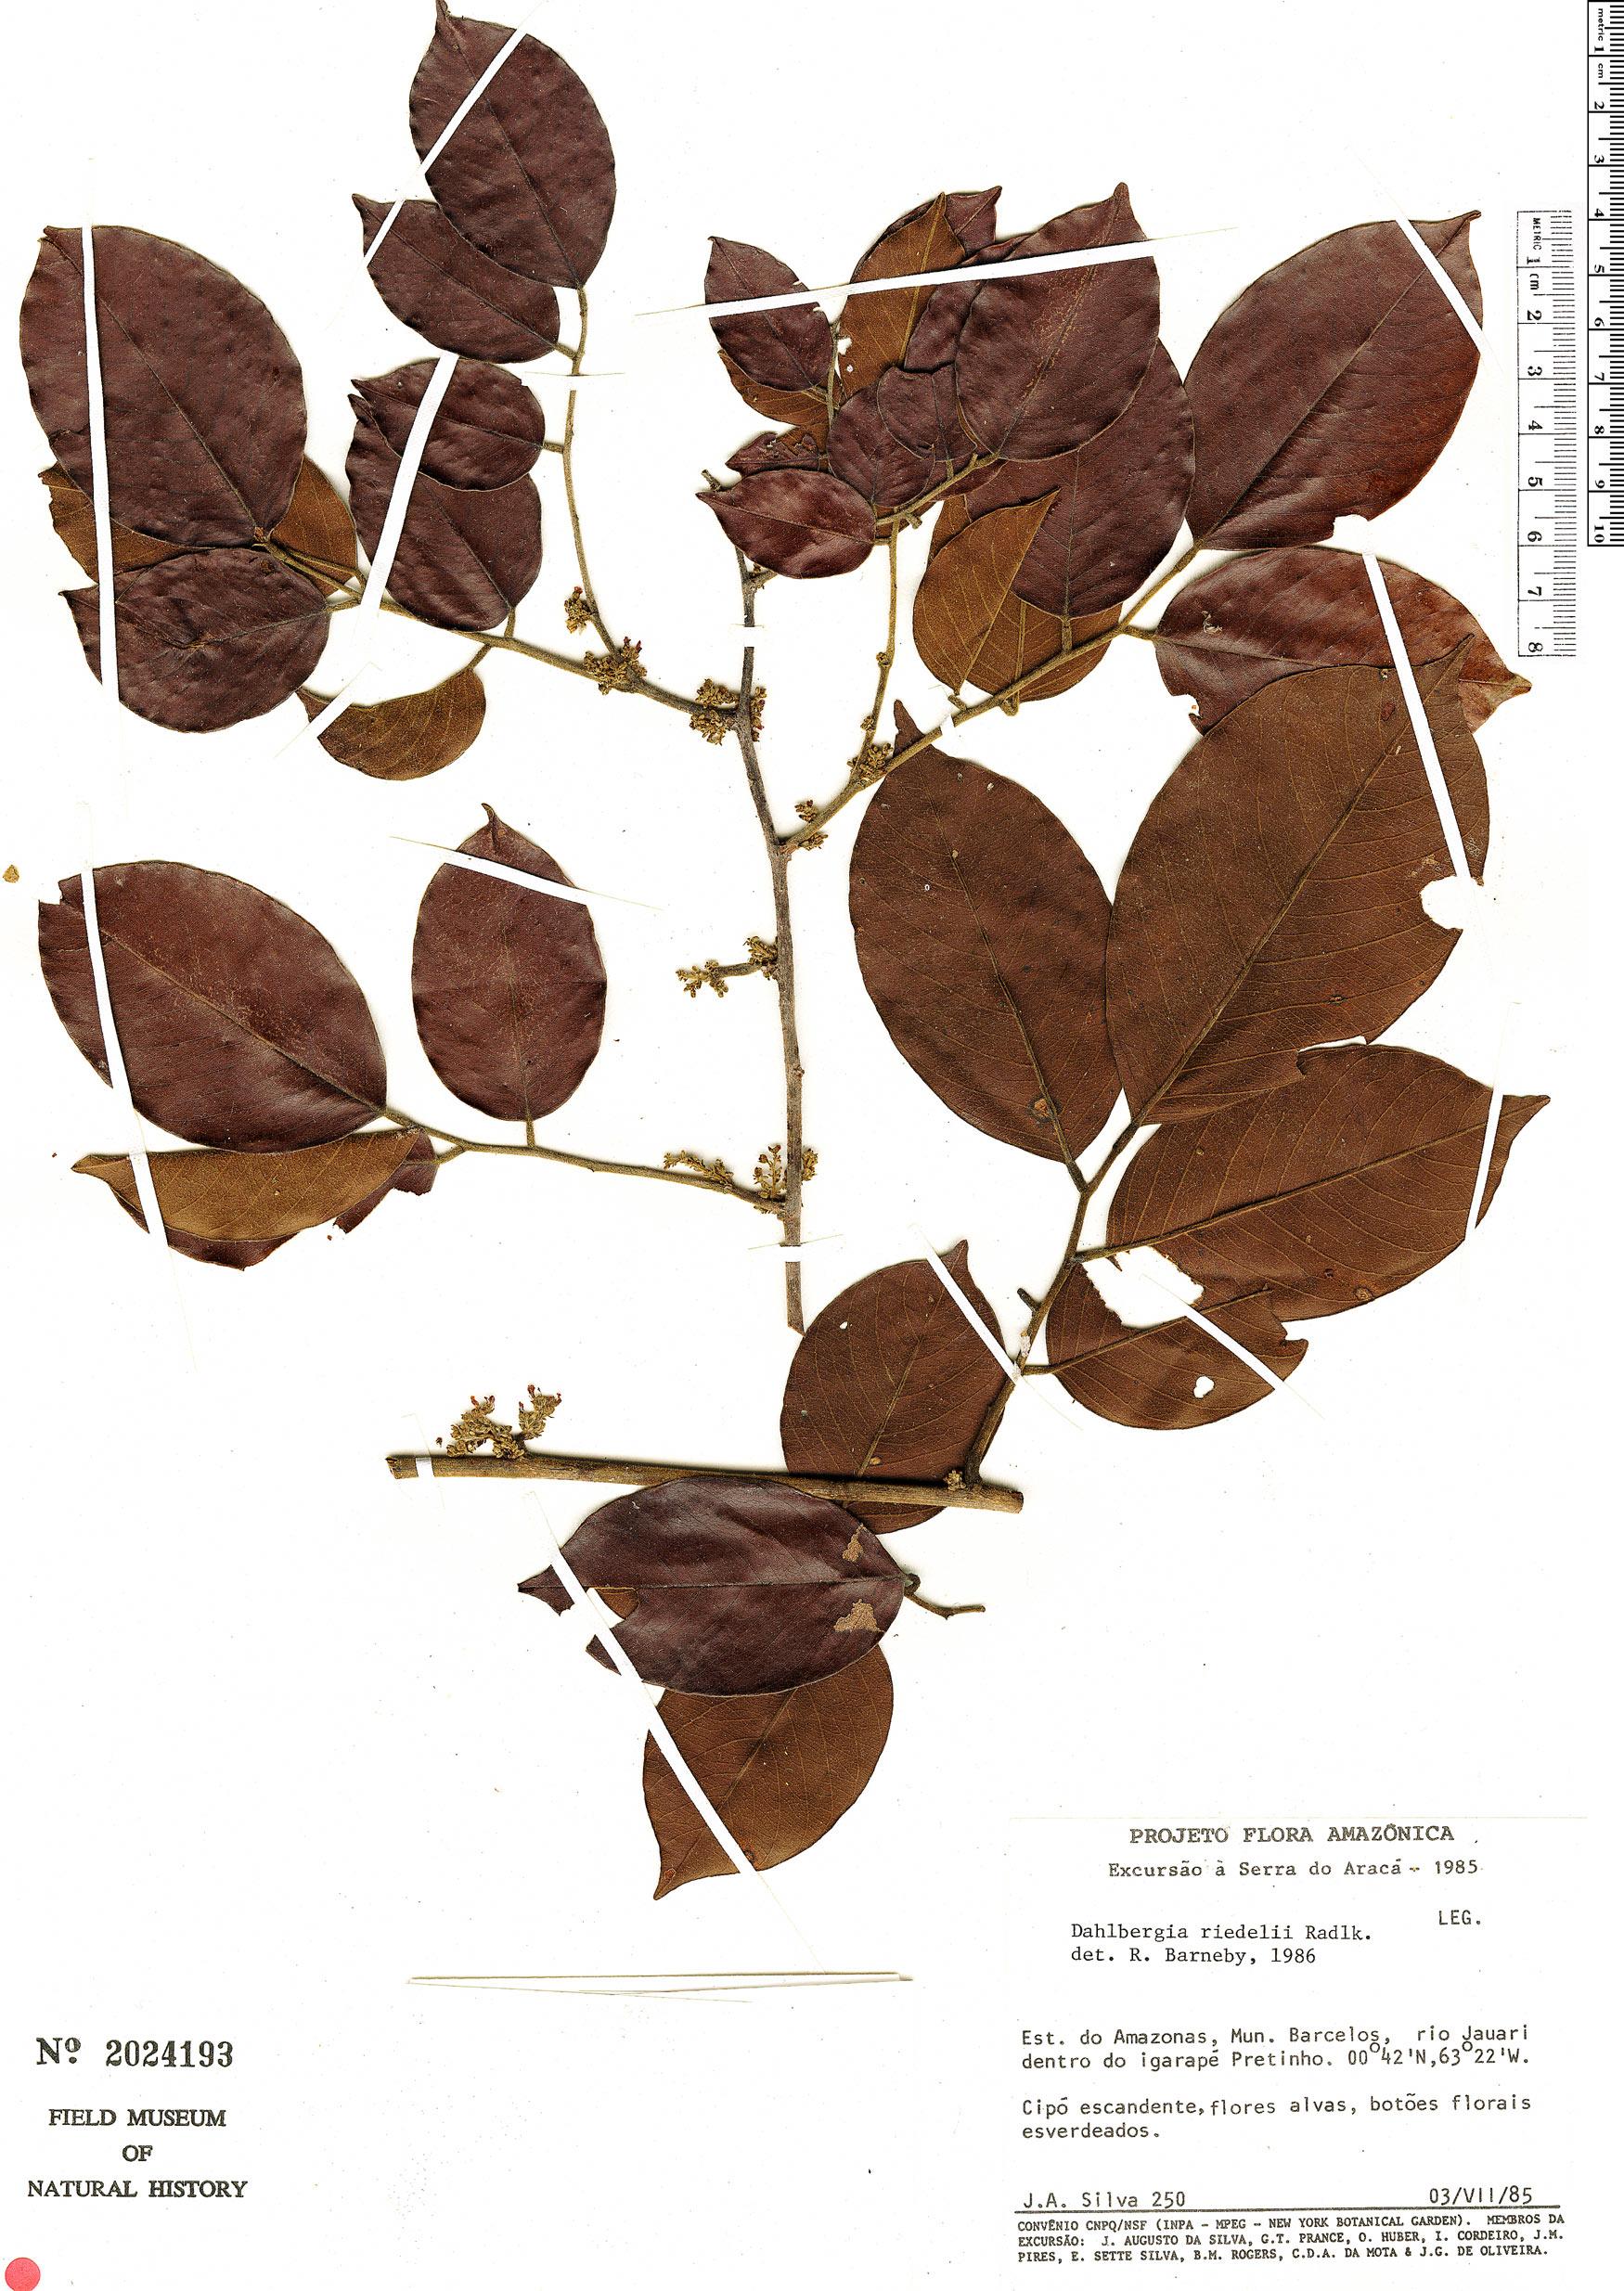 Specimen: Dalbergia riedelii